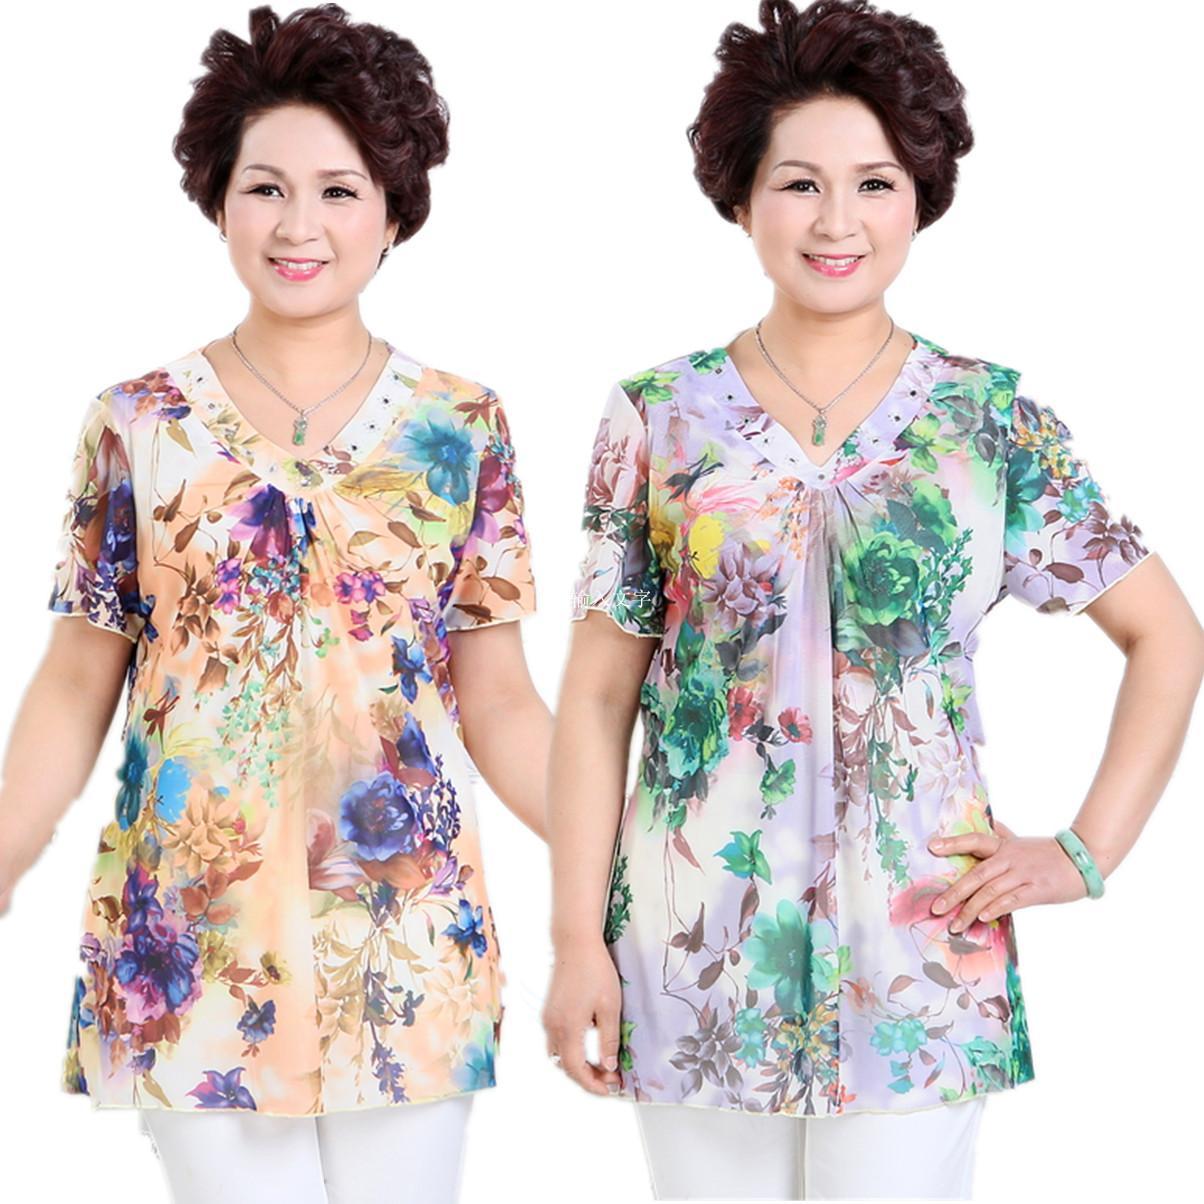 【VIP官网】中老年女式t恤妈妈衫中年韩版夏装妈妈淘宝低至29